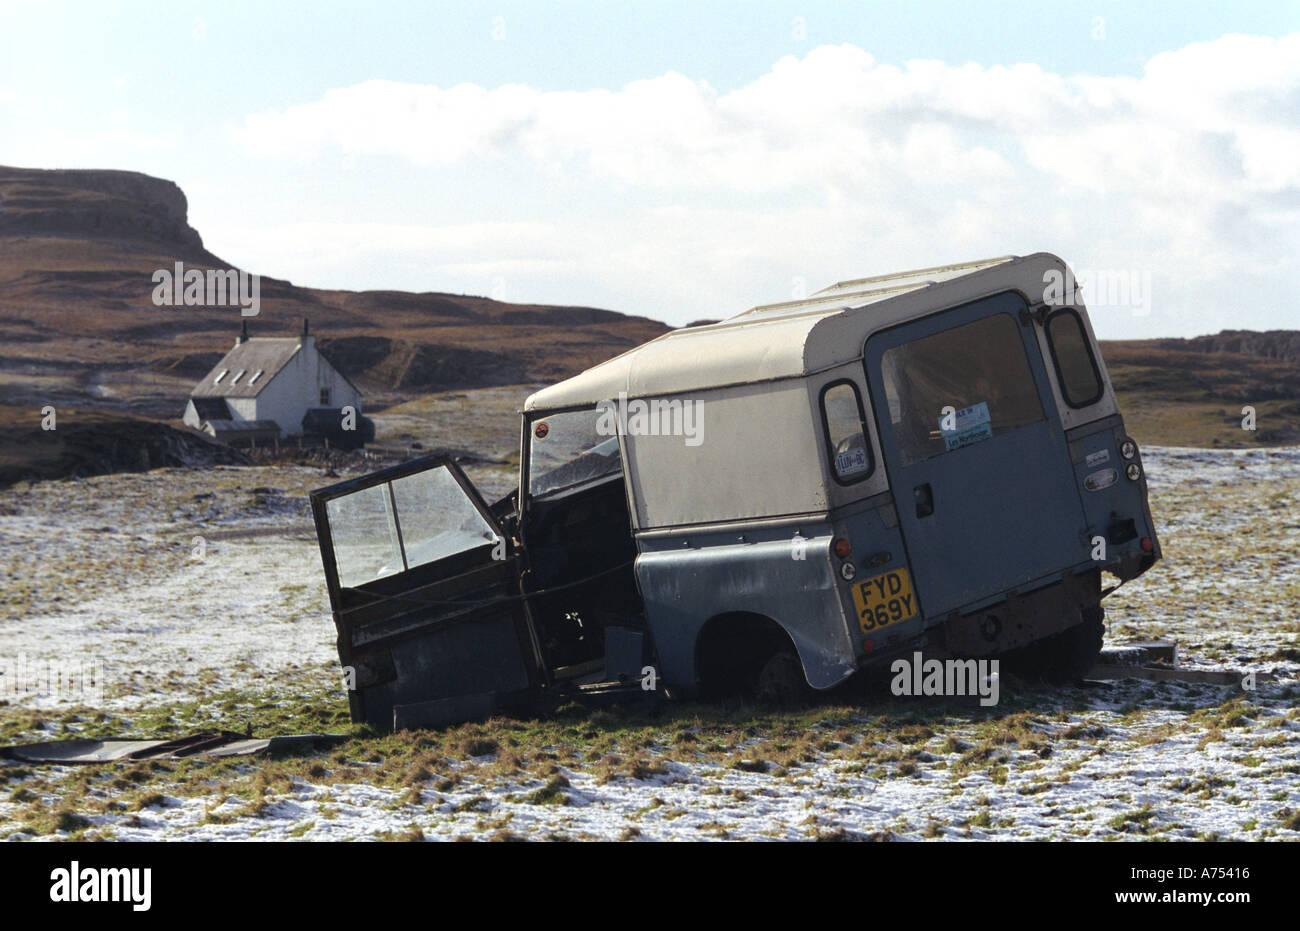 Dead Land Rover On Isle Of Canna Scotland Stock Photo